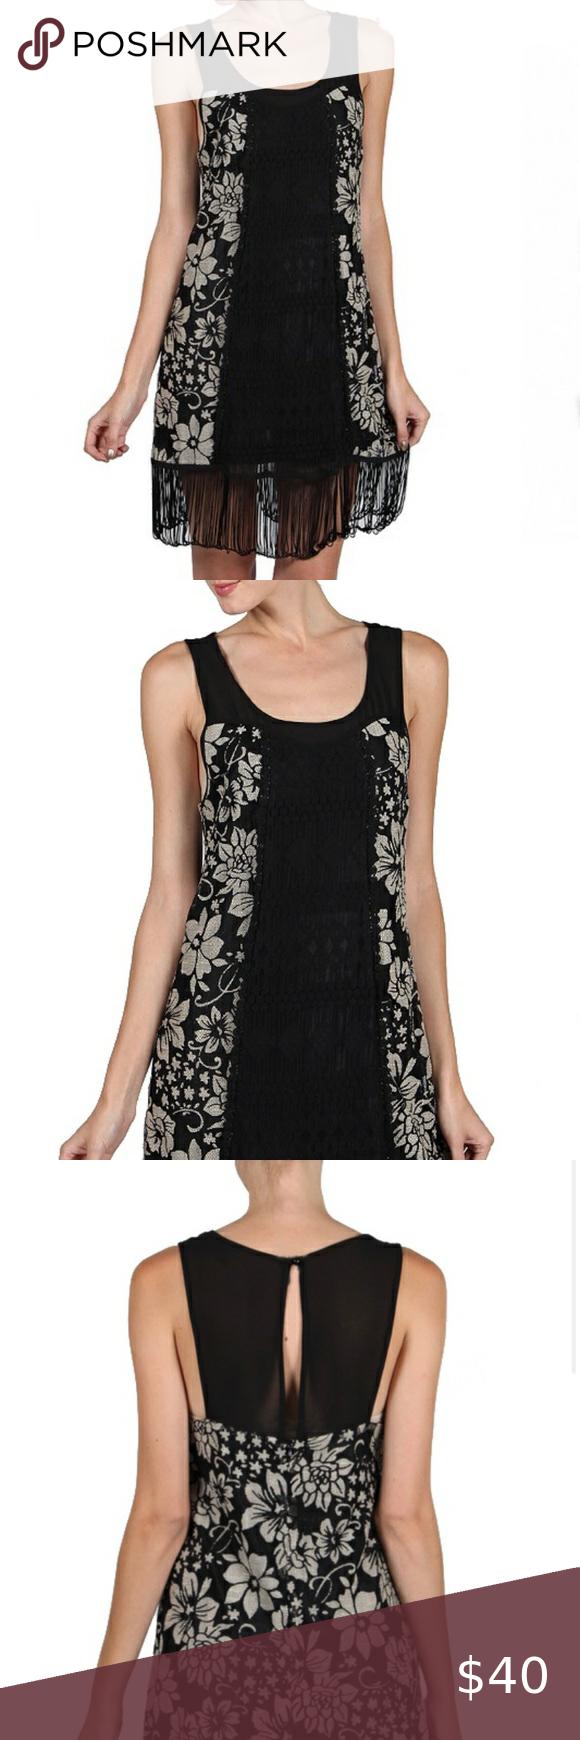 Sale A Reve Black Cream Dress W Fringe Hem Clothes Design Fashion Cream Dress [ 1740 x 580 Pixel ]